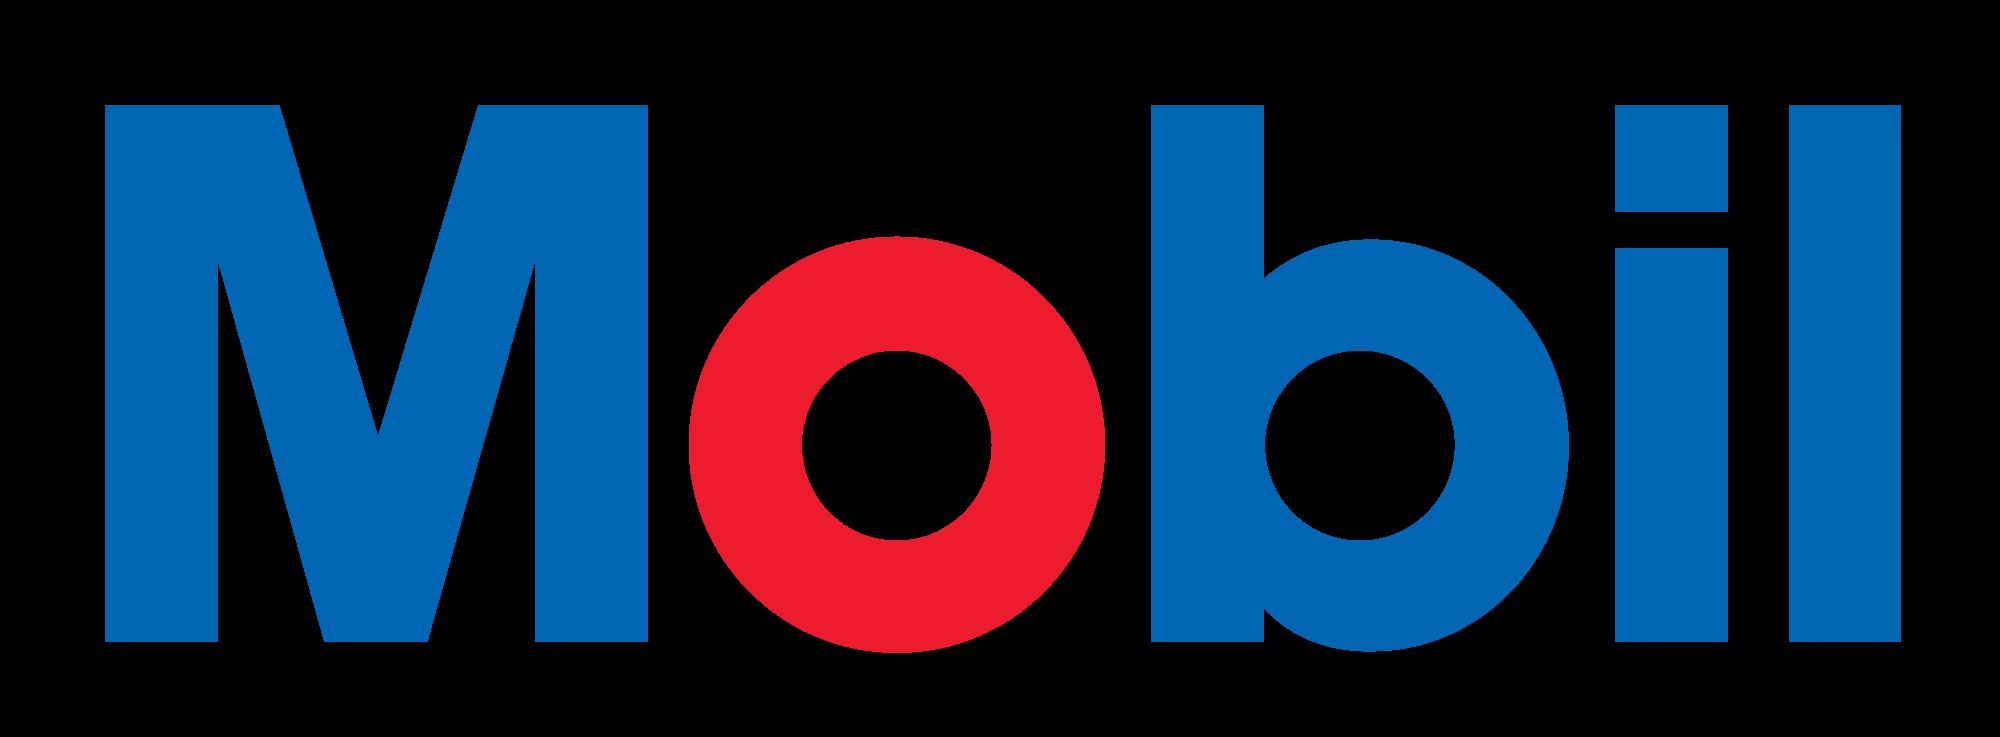 exxonmobil-logo-png-open-2000.png